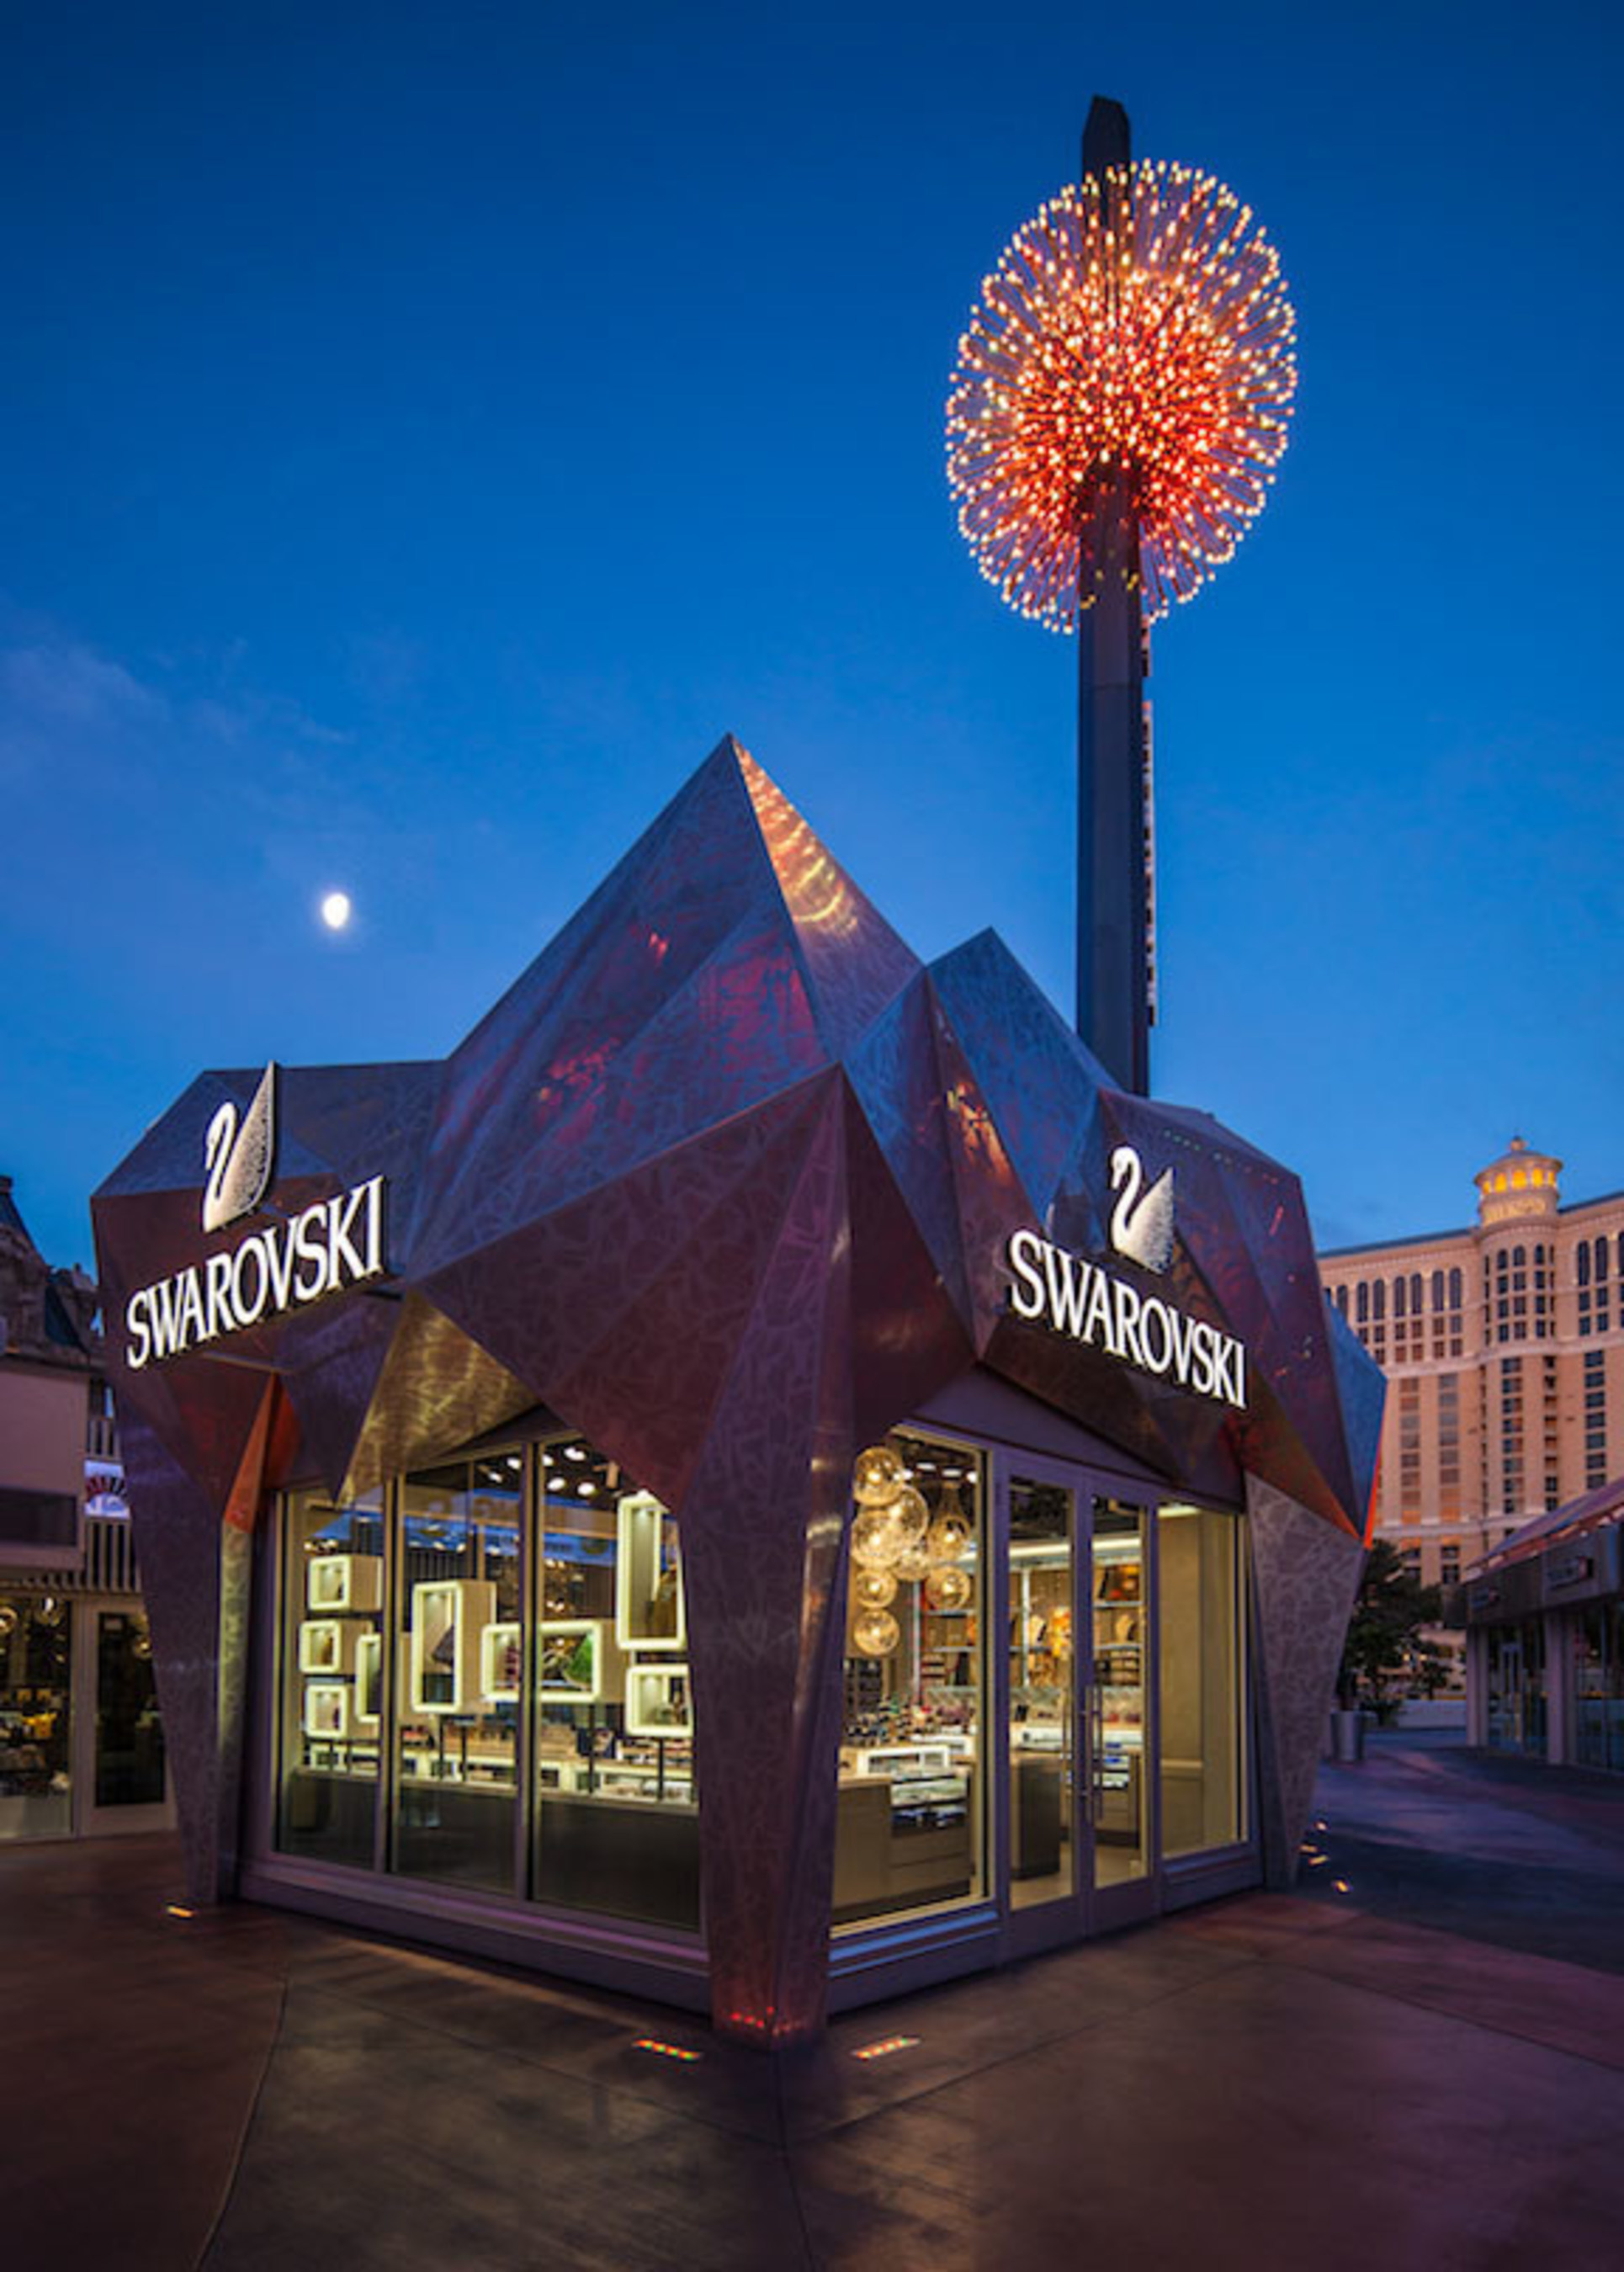 https www prnewswire com news releases yesco lights up las vegas at the swarovski las vegas grand bazaar shops 300091735 html